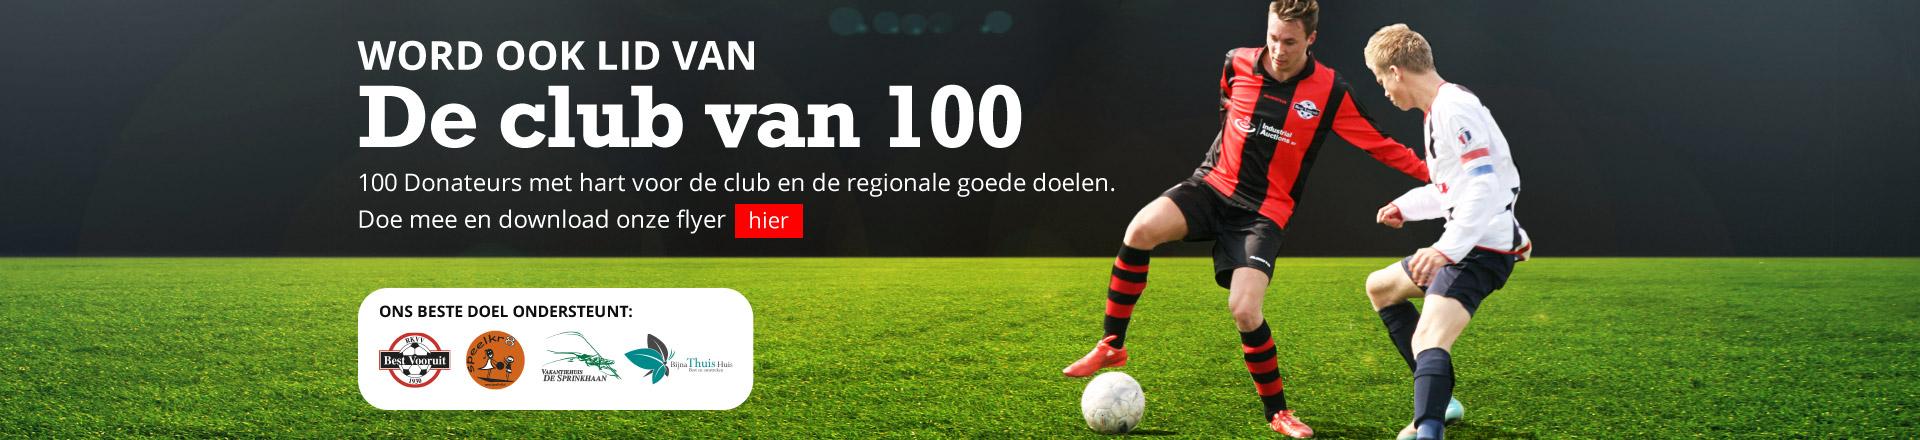 De Club van 100